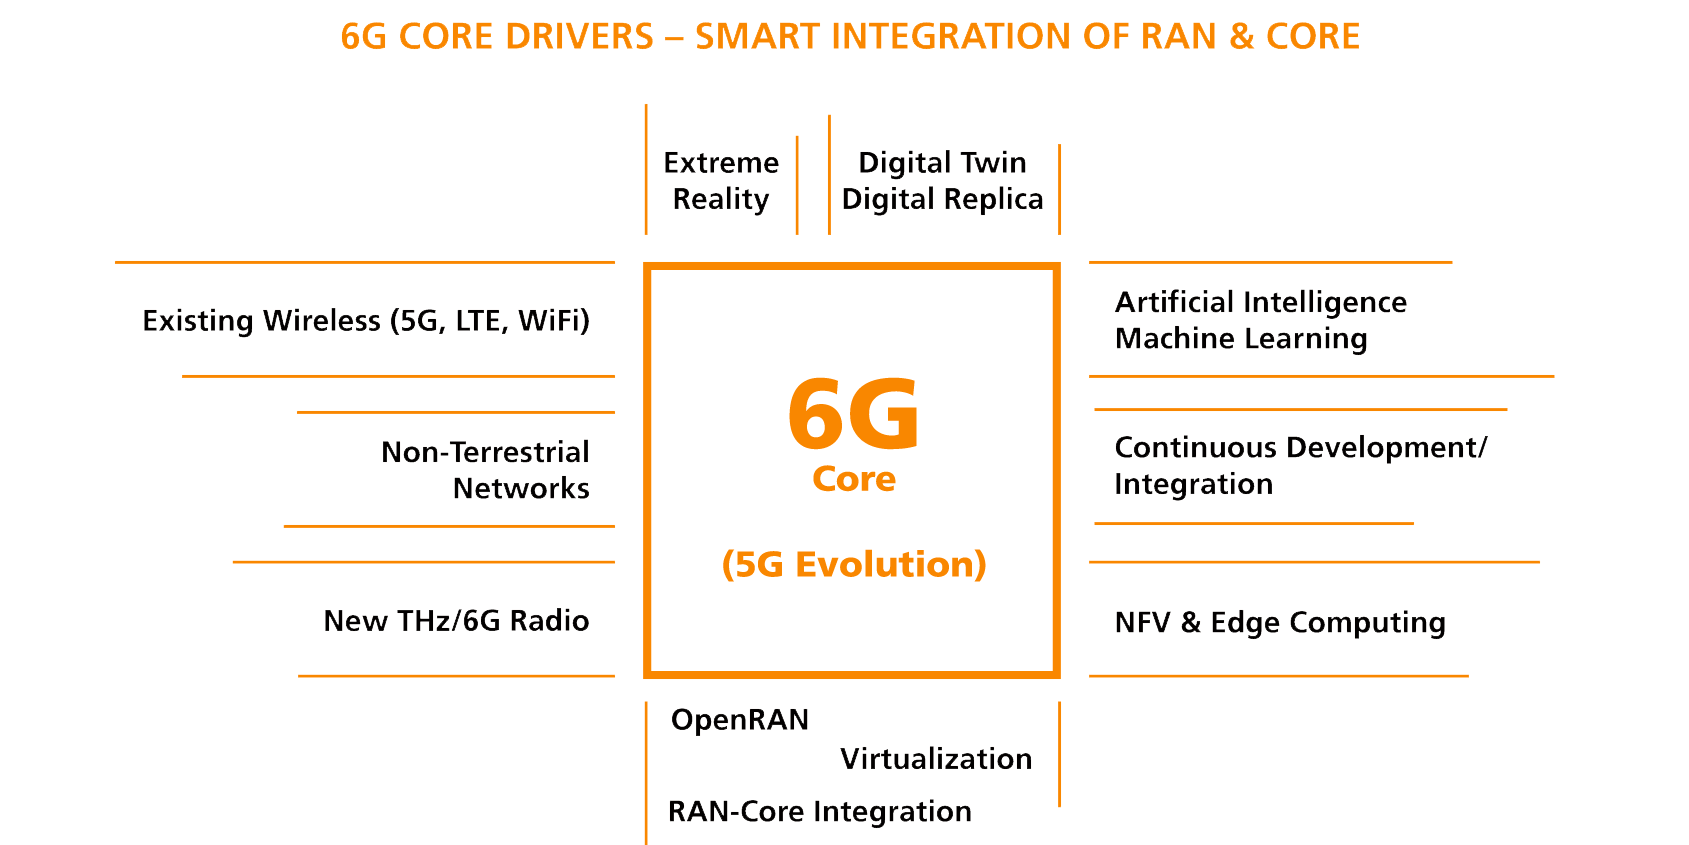 6G Core korrigiert